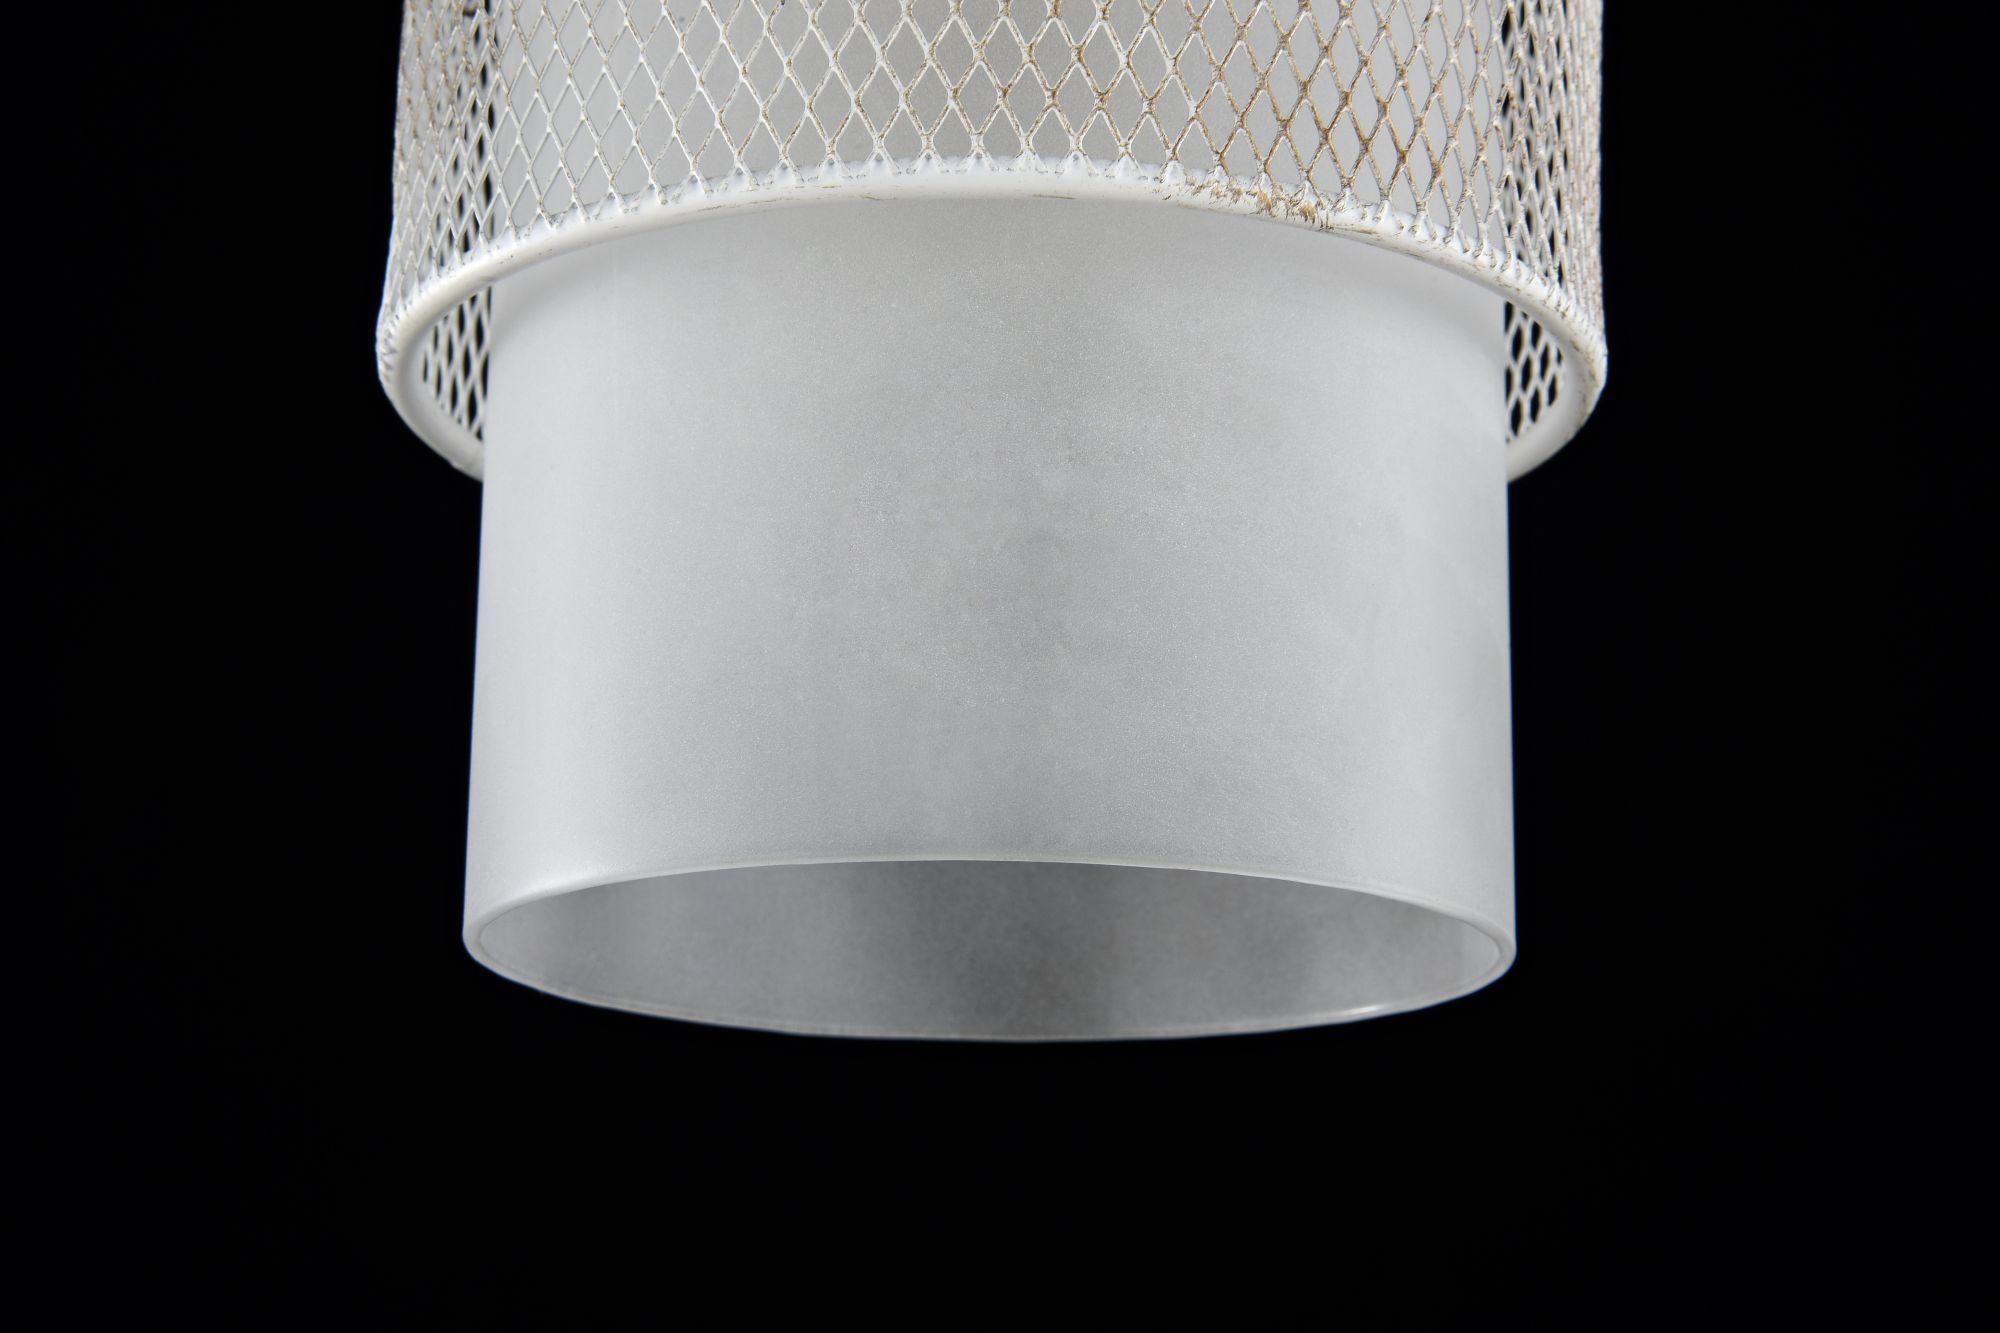 Подвесной светильник Freya Ornella FR2201-PL-01-WG (fr201-11-w), 1xE27x60W, белый, металл, металл со стеклом/пластиком - фото 4